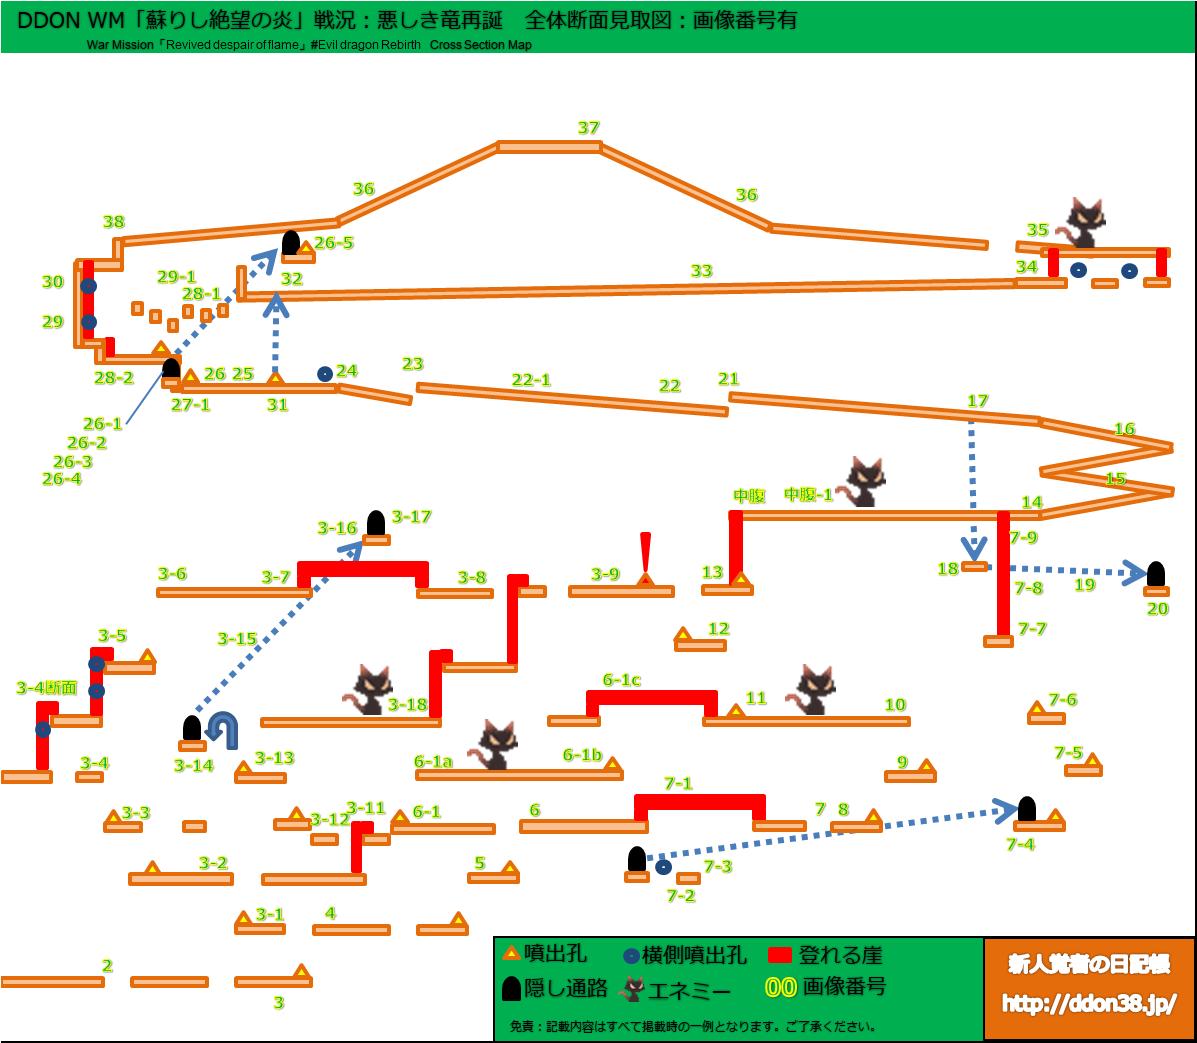 WM_Evil_Dragon_Rebirth_cross_section_map_PN2.png